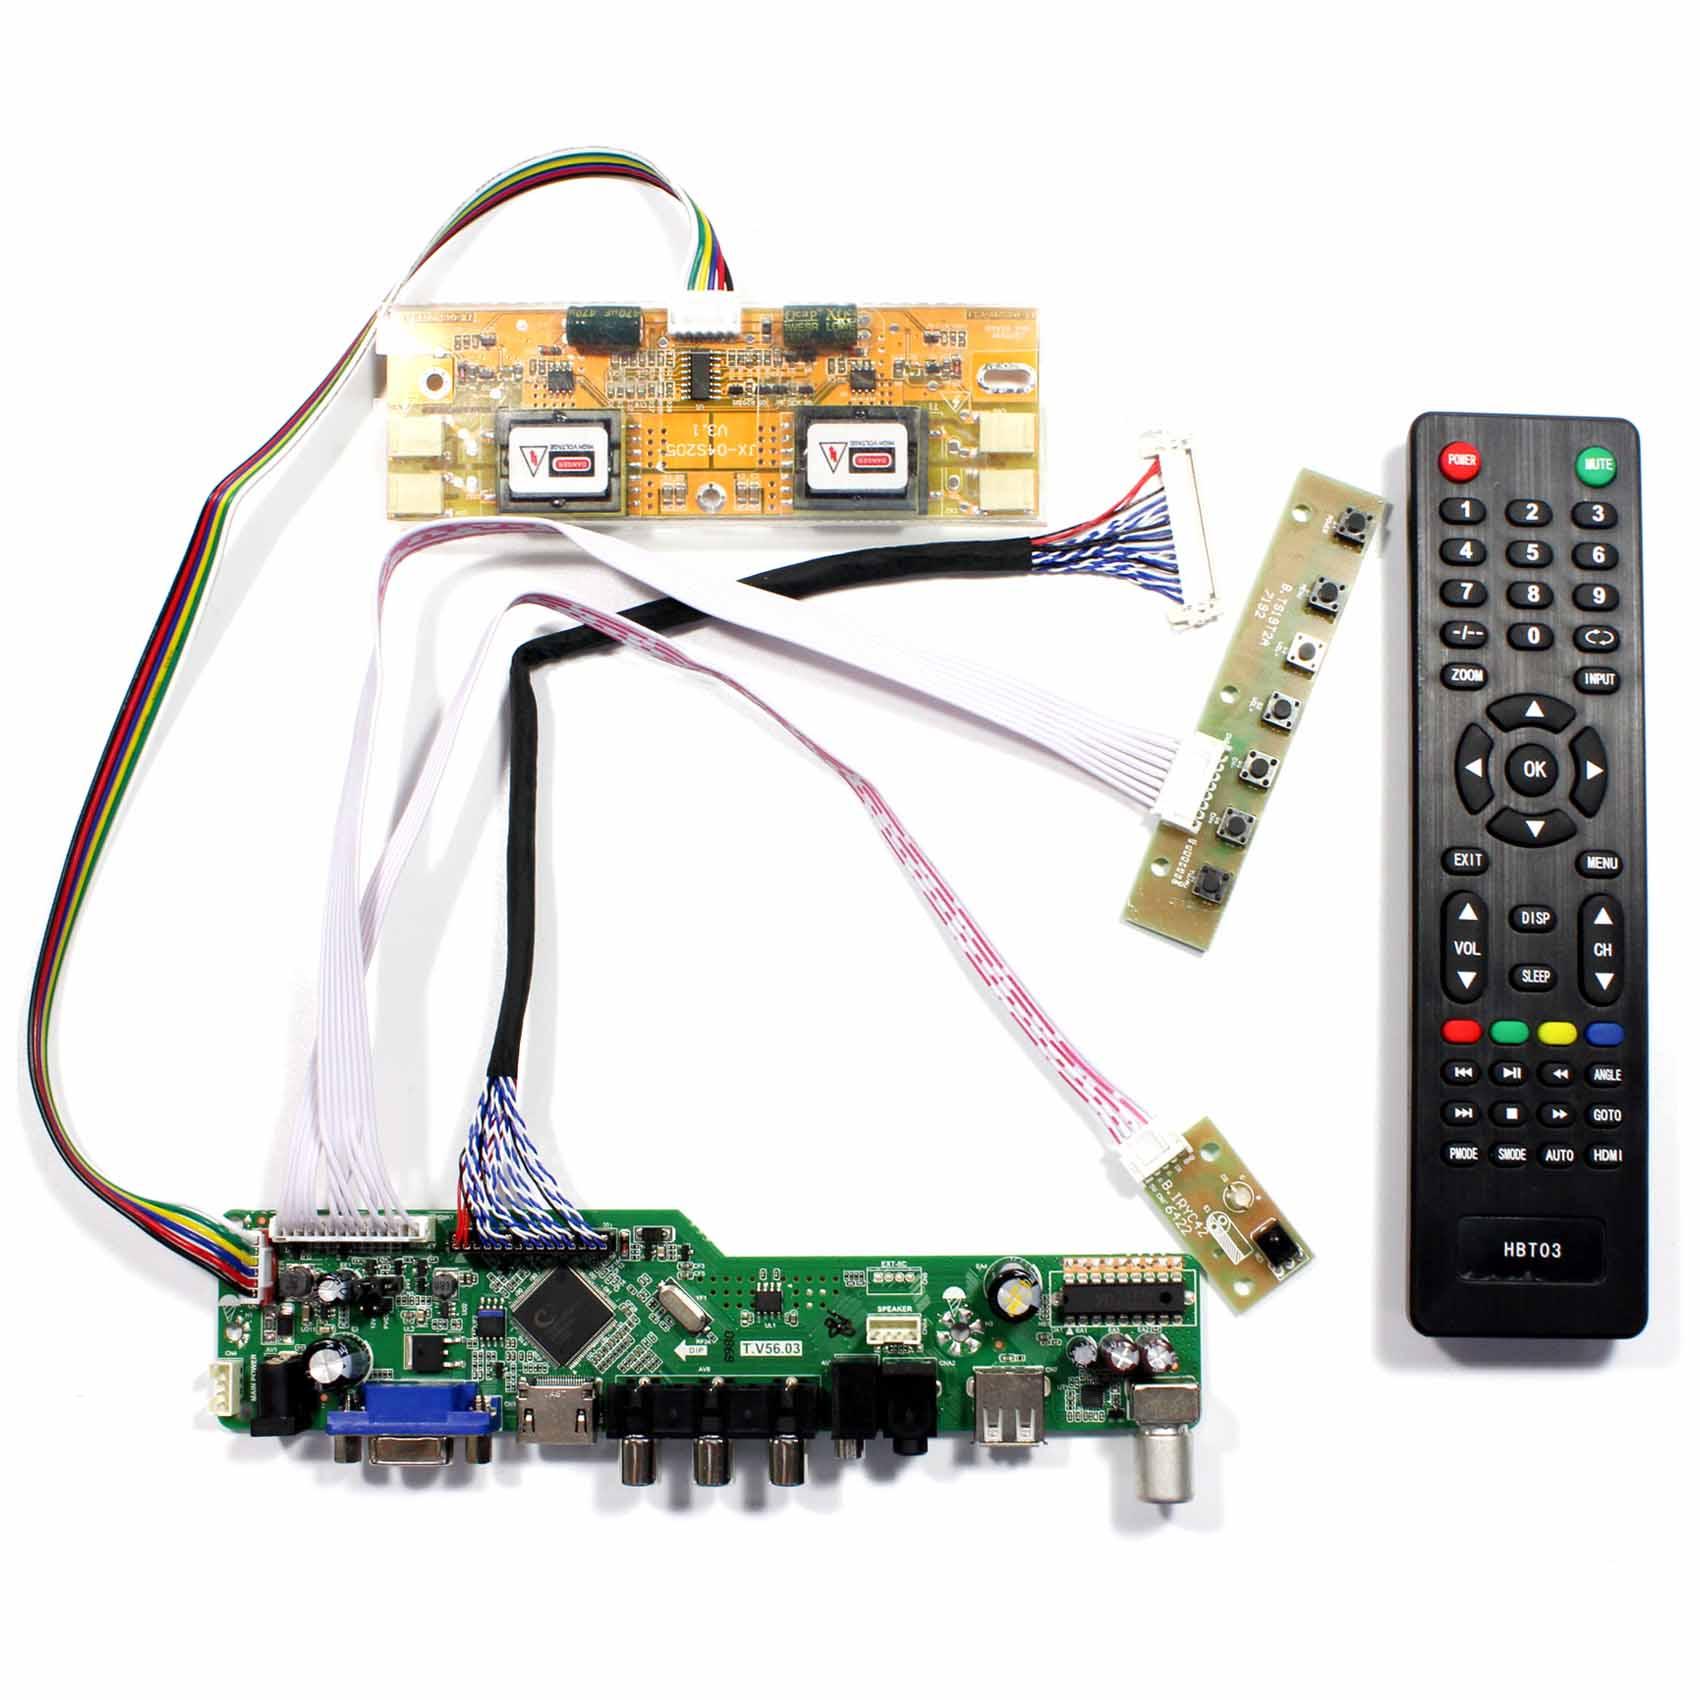 TV HDMI VGA AV USB AUDIO LCD Controlador Board Para 20.1 22 M201EW02 V1 M201EW02 V8 M201EW02 V9 m220EW01 1680x1050 Tela de LCD